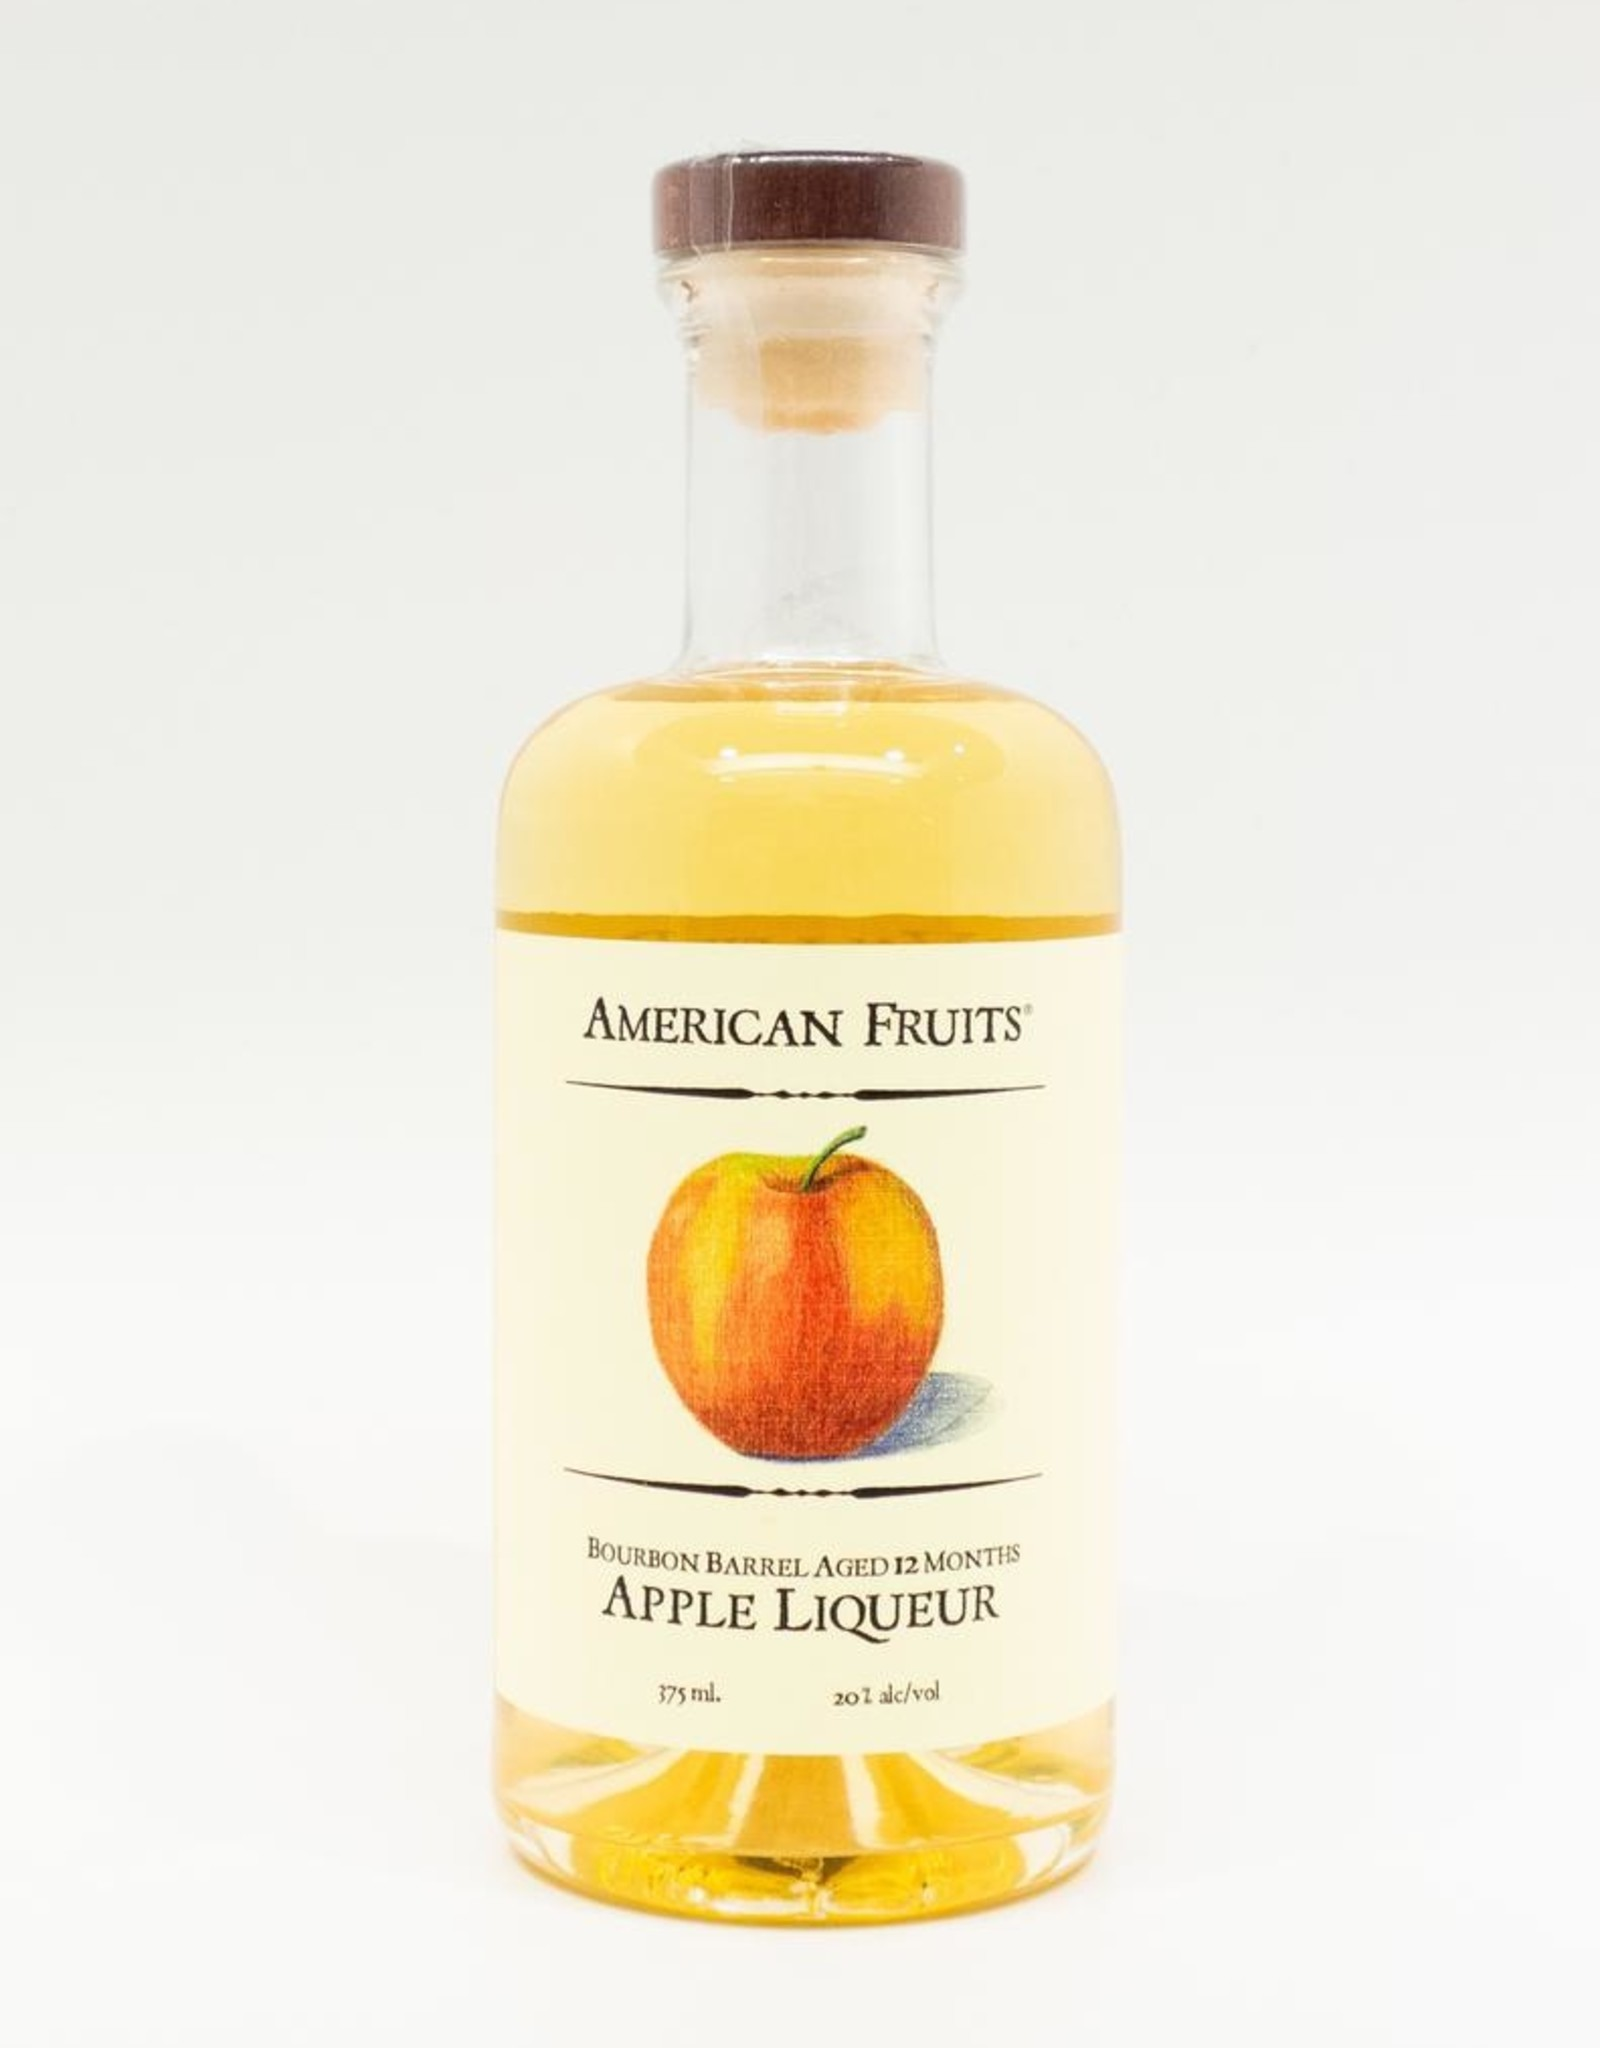 Spirits-Liqueur-Fruit American Fruits Distillery Bourbon Barrel Aged Apple Liqueur 375ml